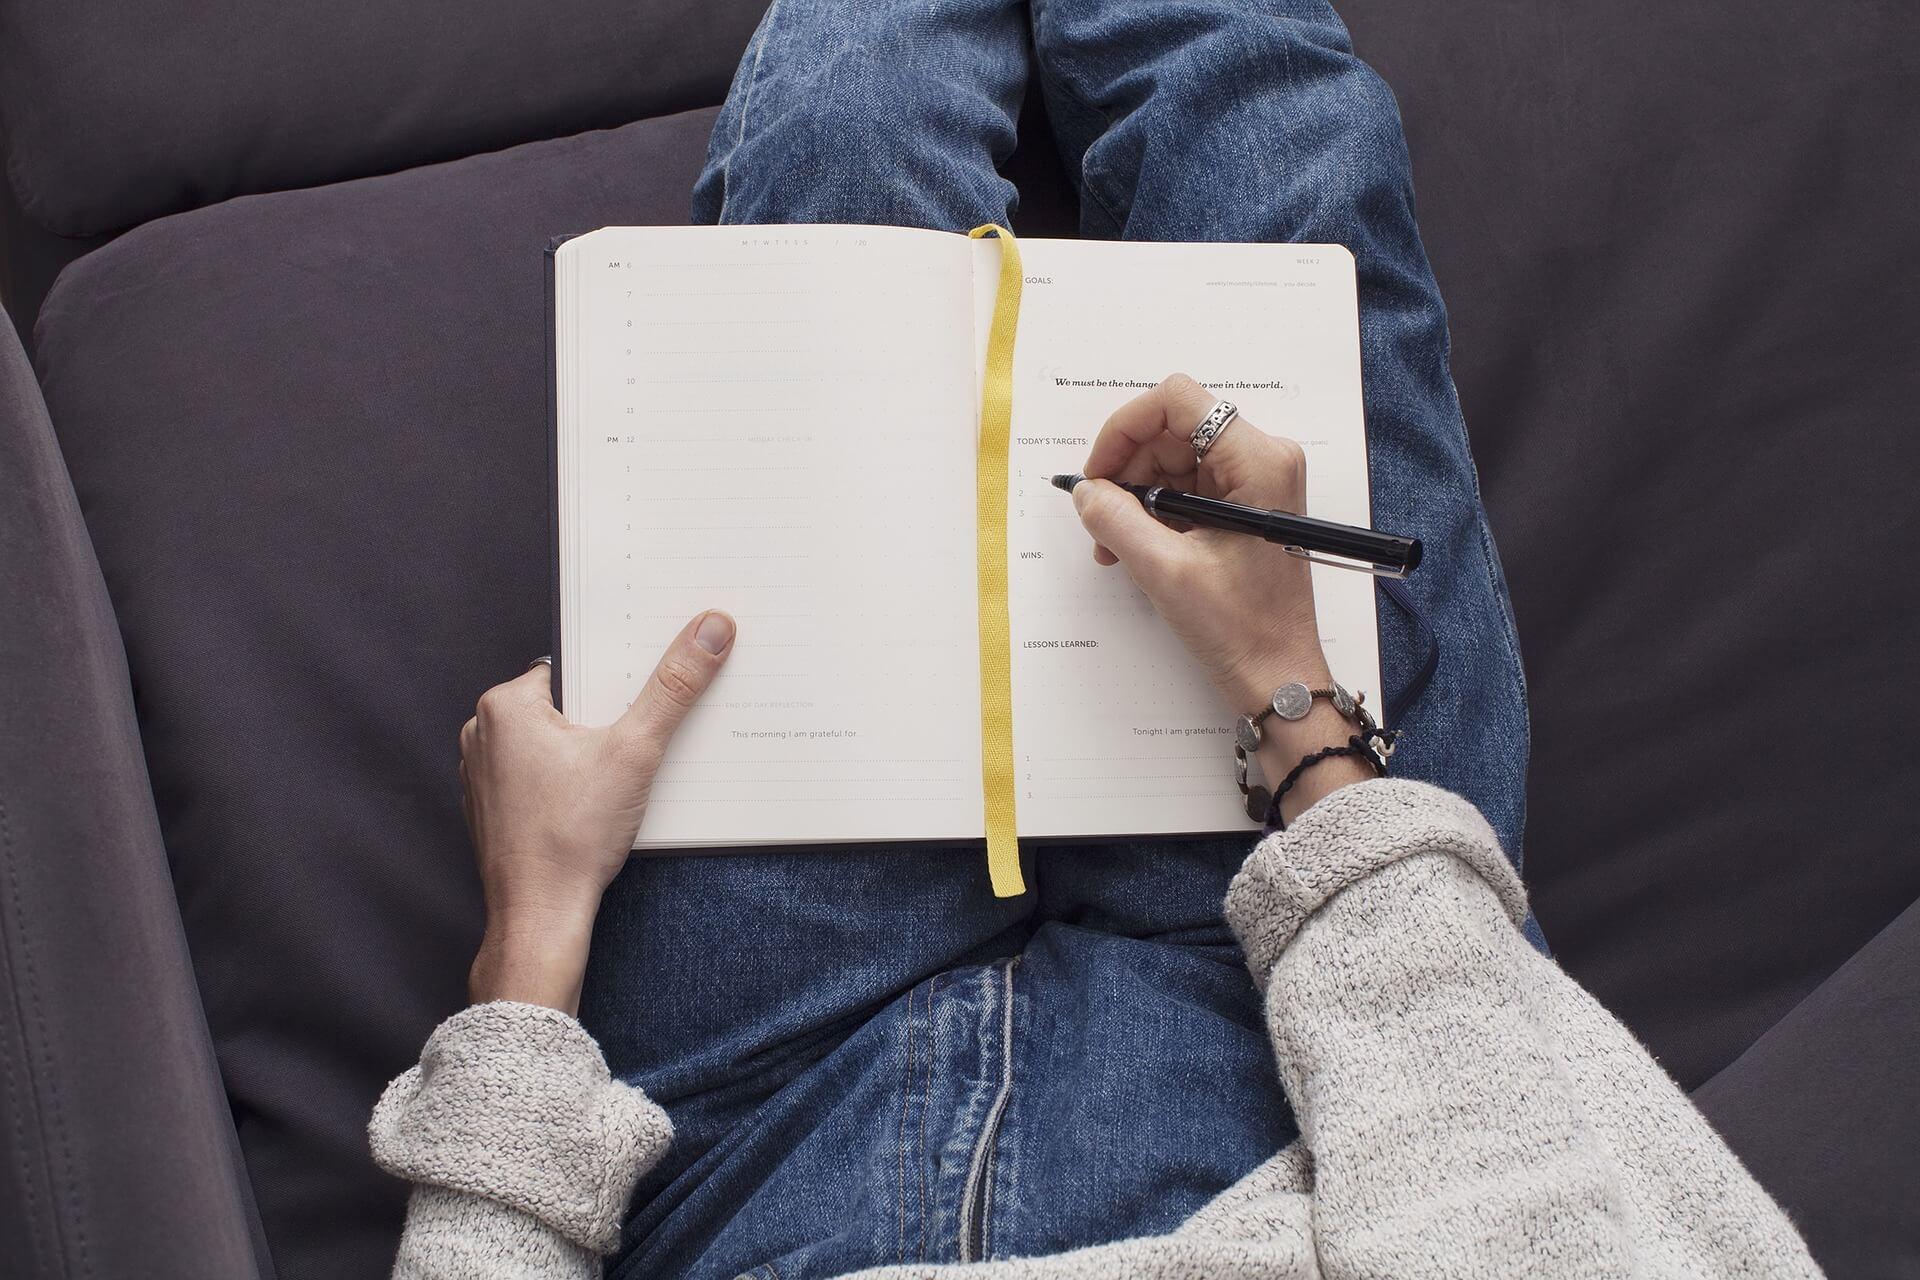 Journal daily to de-stress